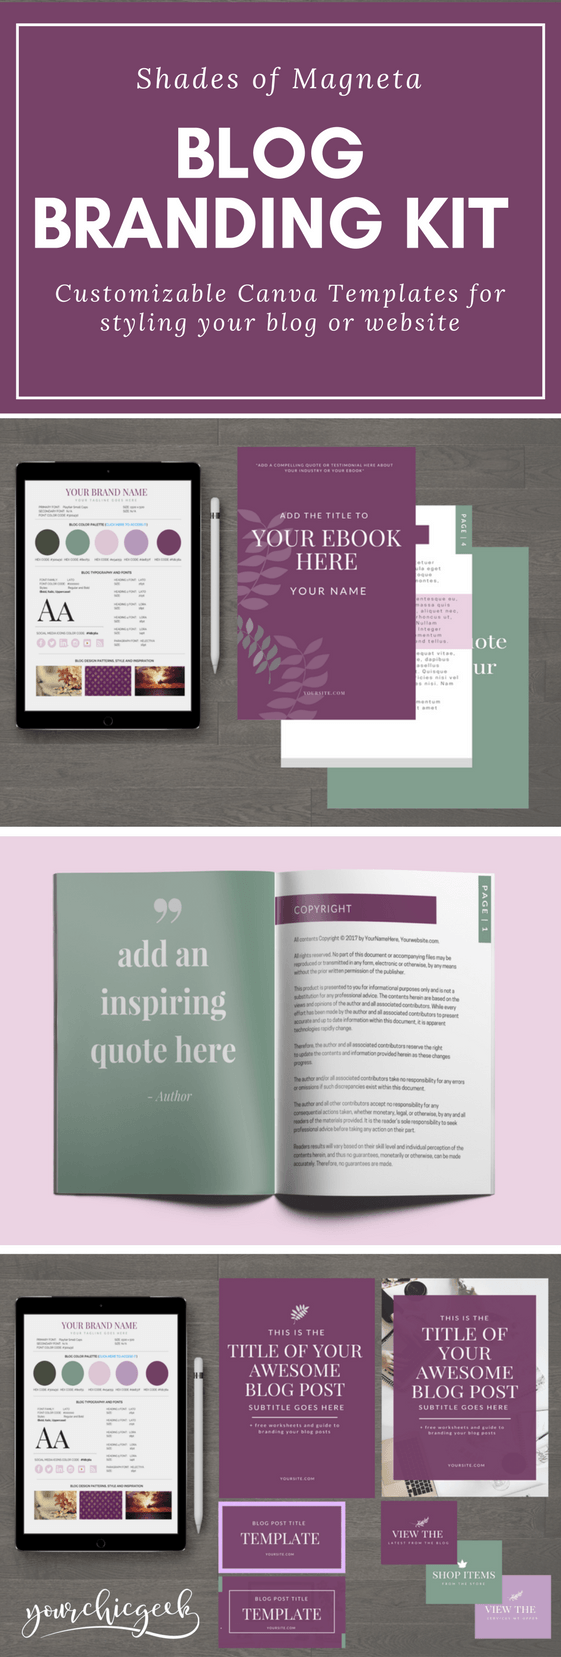 Shades of Magenta Blog Branding Kit